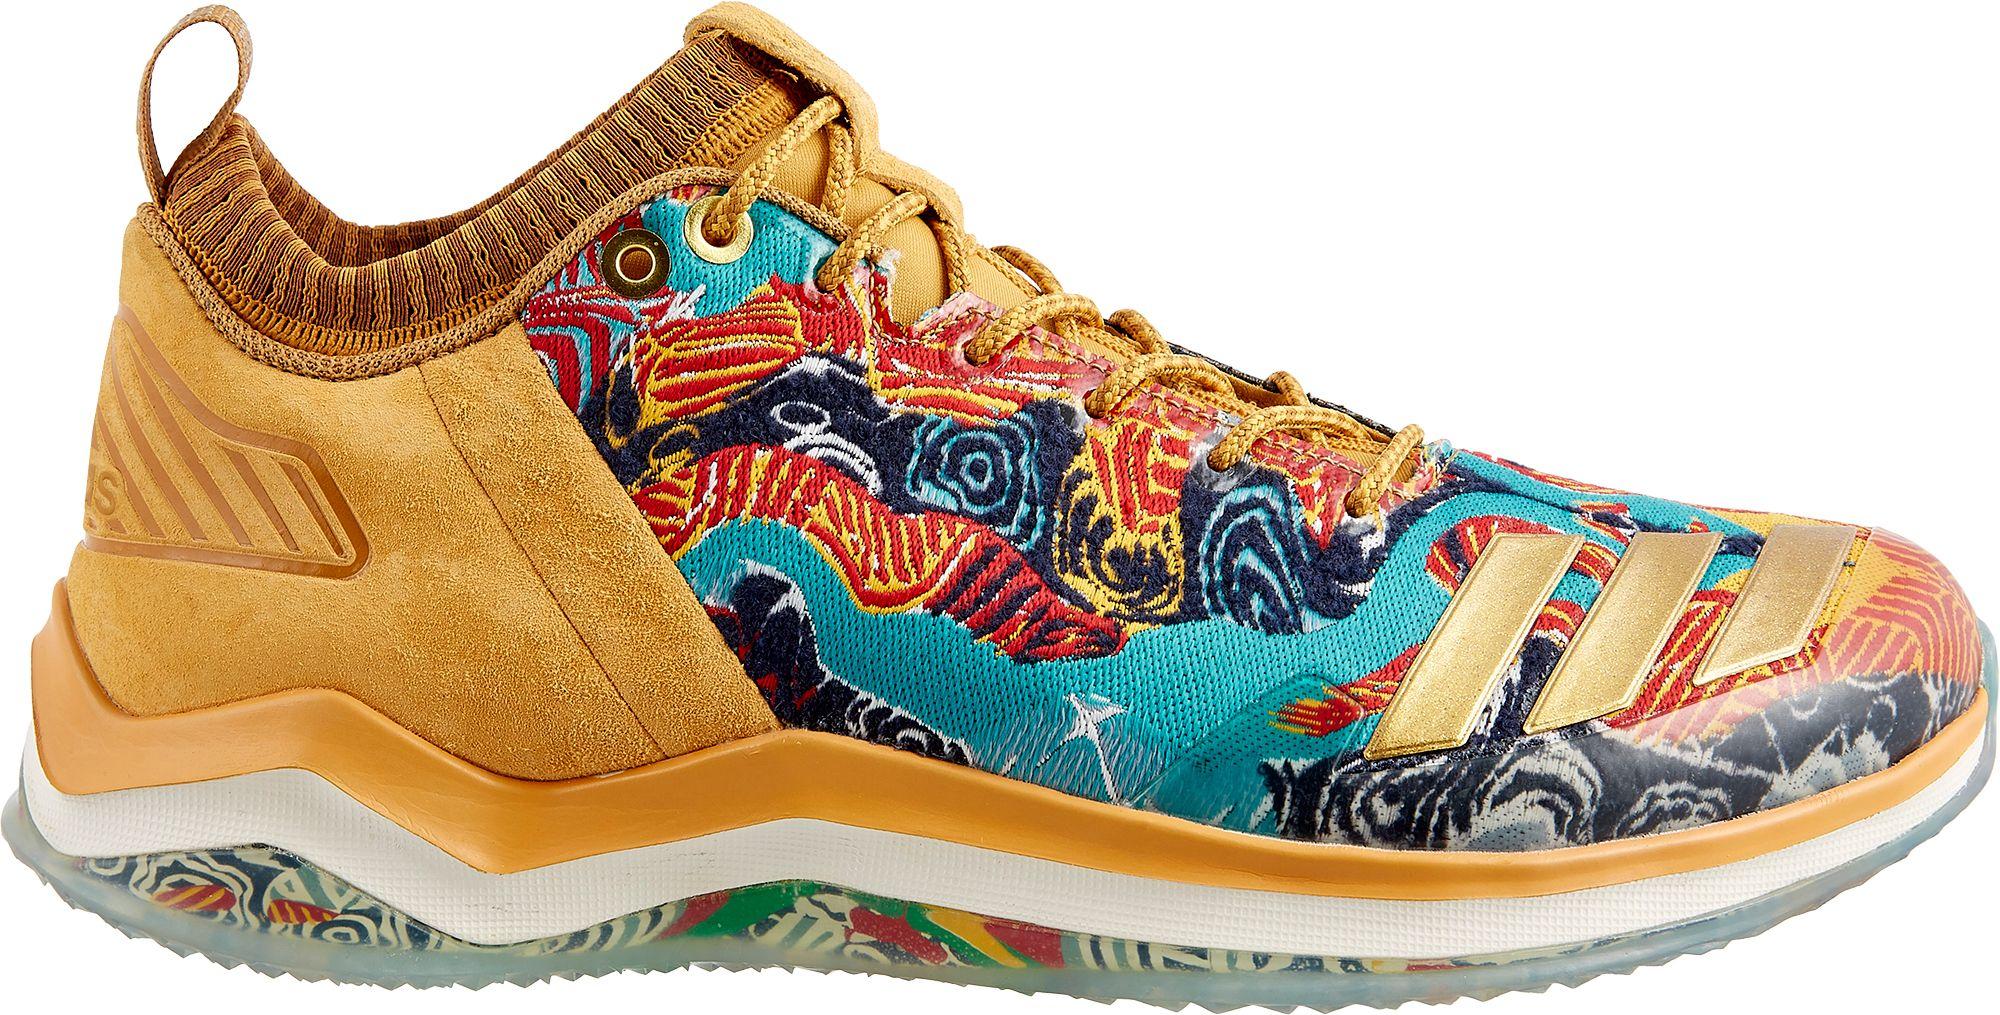 aae045d4ff19d7 adidas Men s Icon New York Baseball Turf Shoes  49.59 + Free Shipping